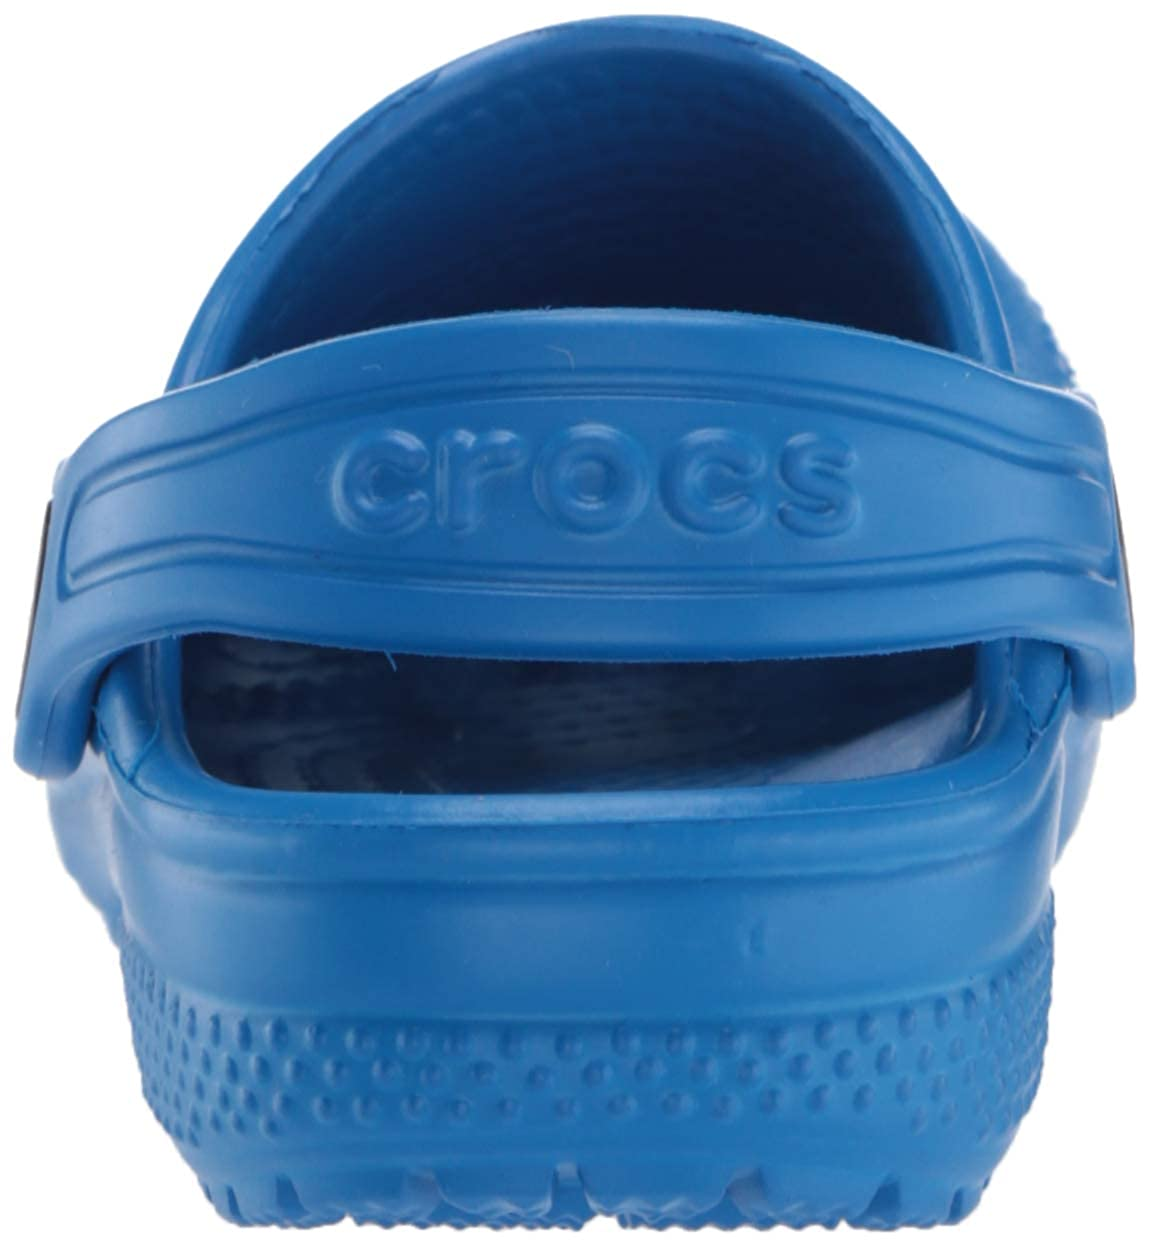 Bright Cobalt Crocs Kids Classic Clog 11 M US Little Kid